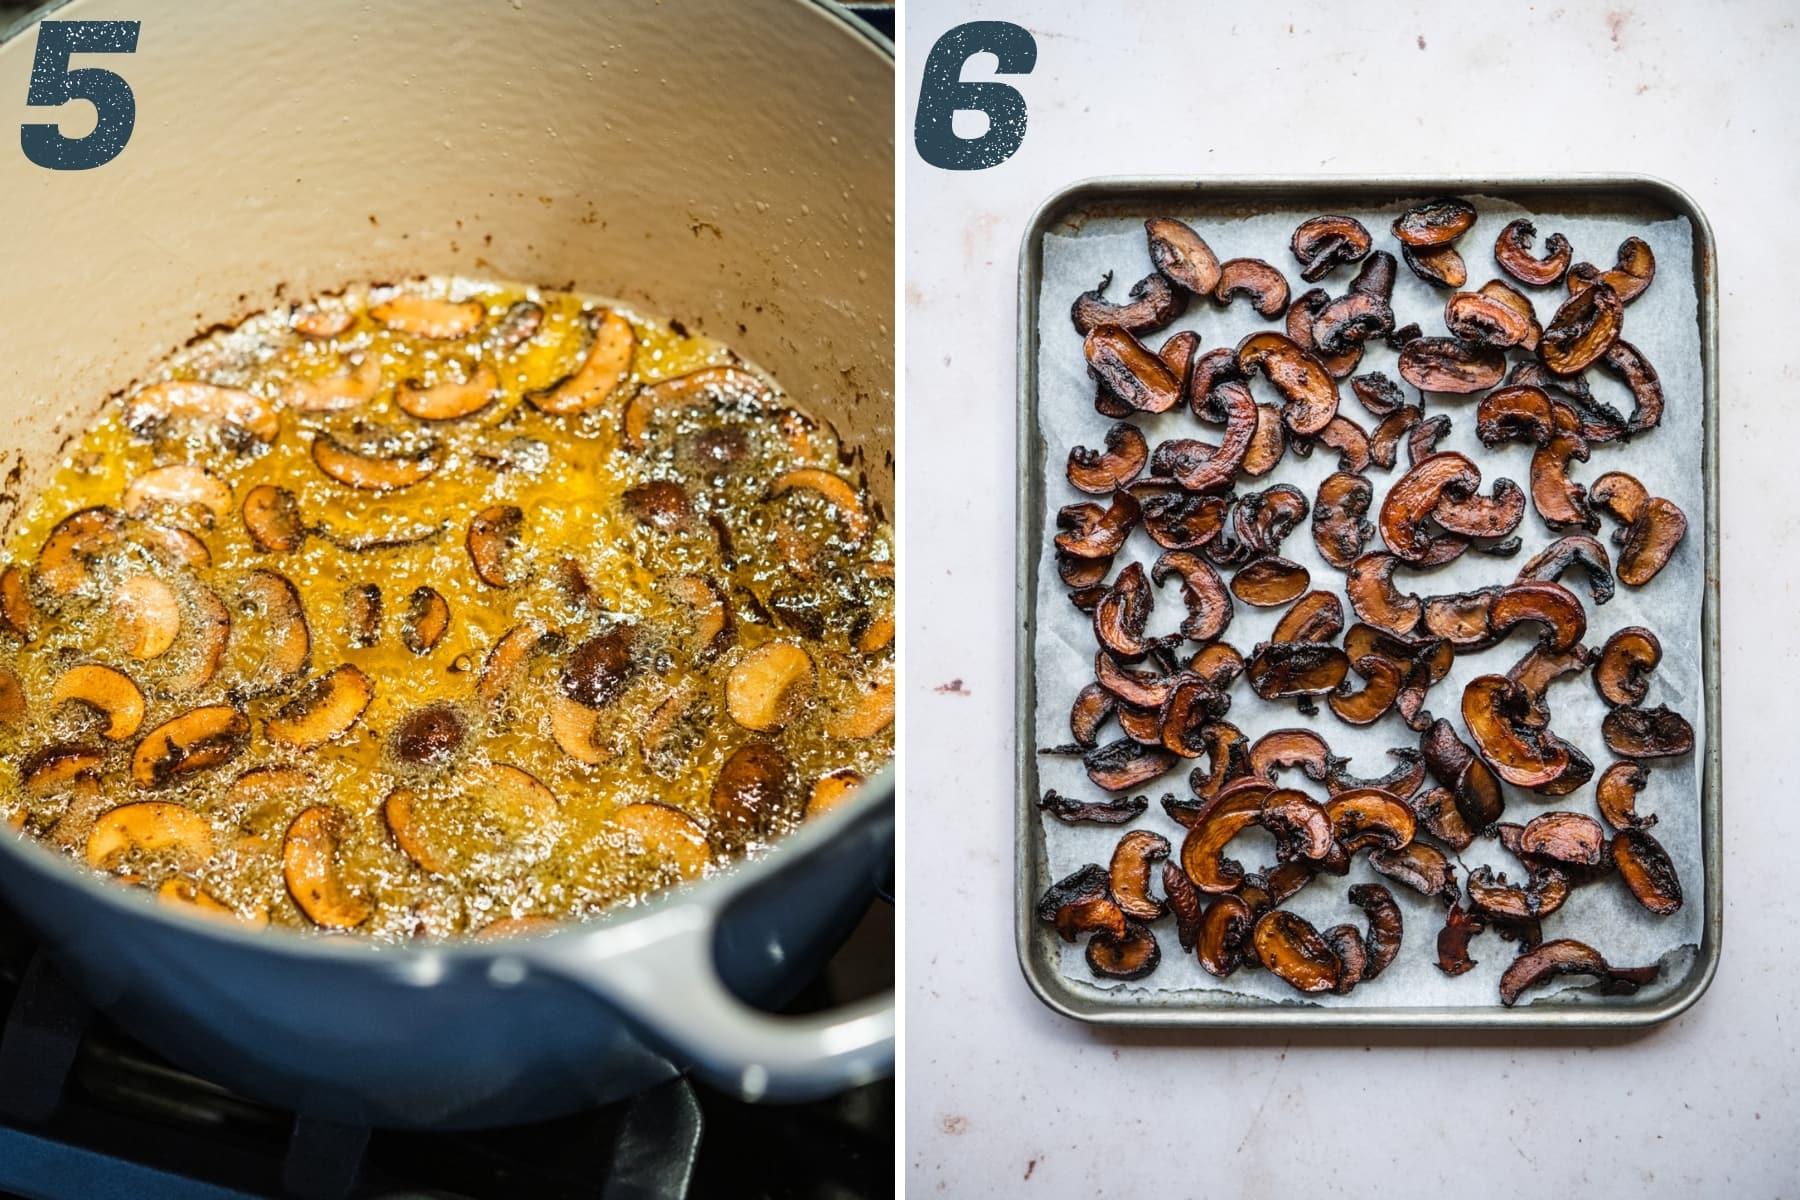 on the left: vegan mushroom bacon in frying pan. on the right: vegan mushroom bacon on parchment paper.